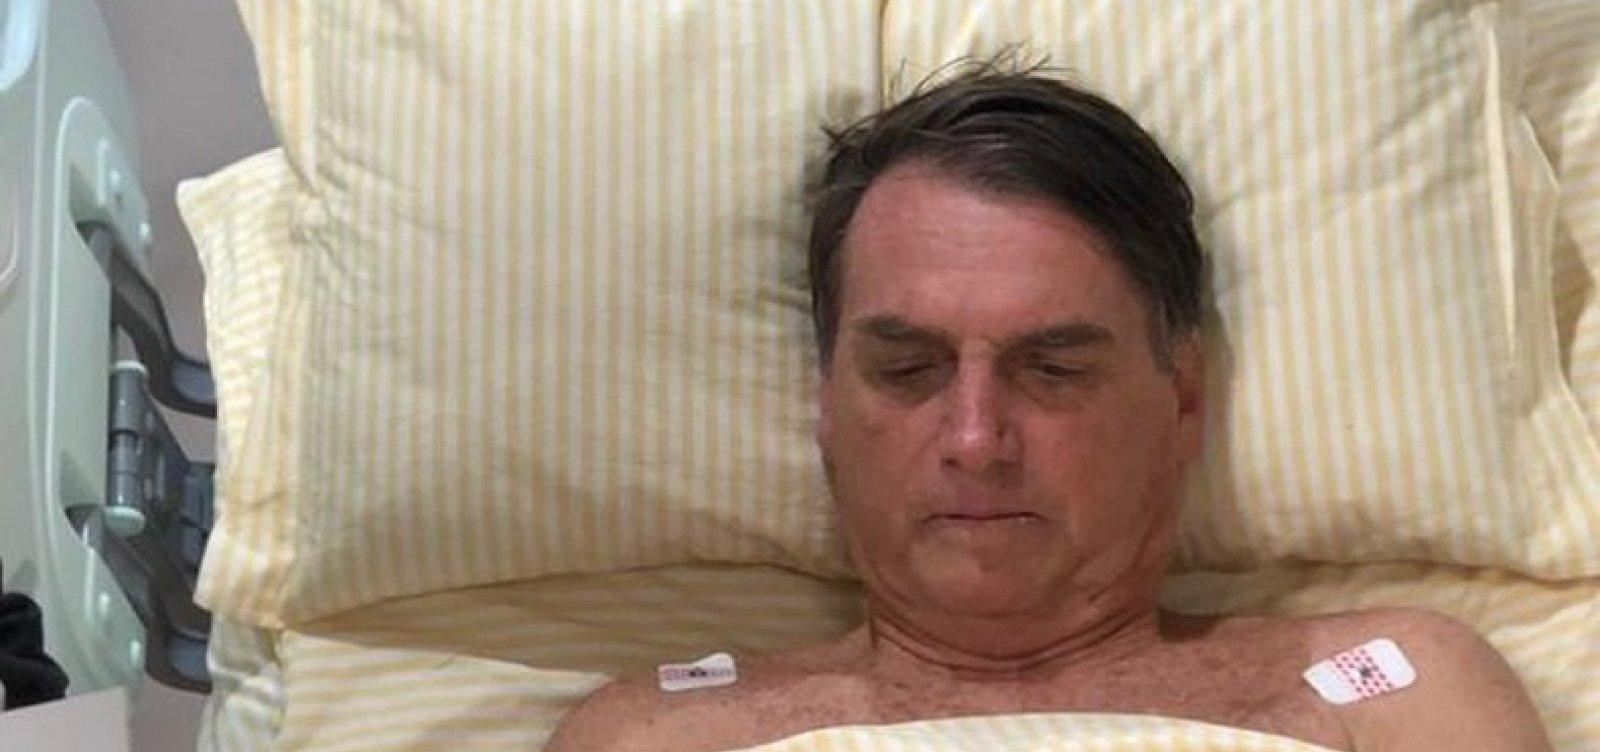 [Bolsonaro deixa Unidade de Terapia Semi-Intensiva e vai para quarto, diz hospital]